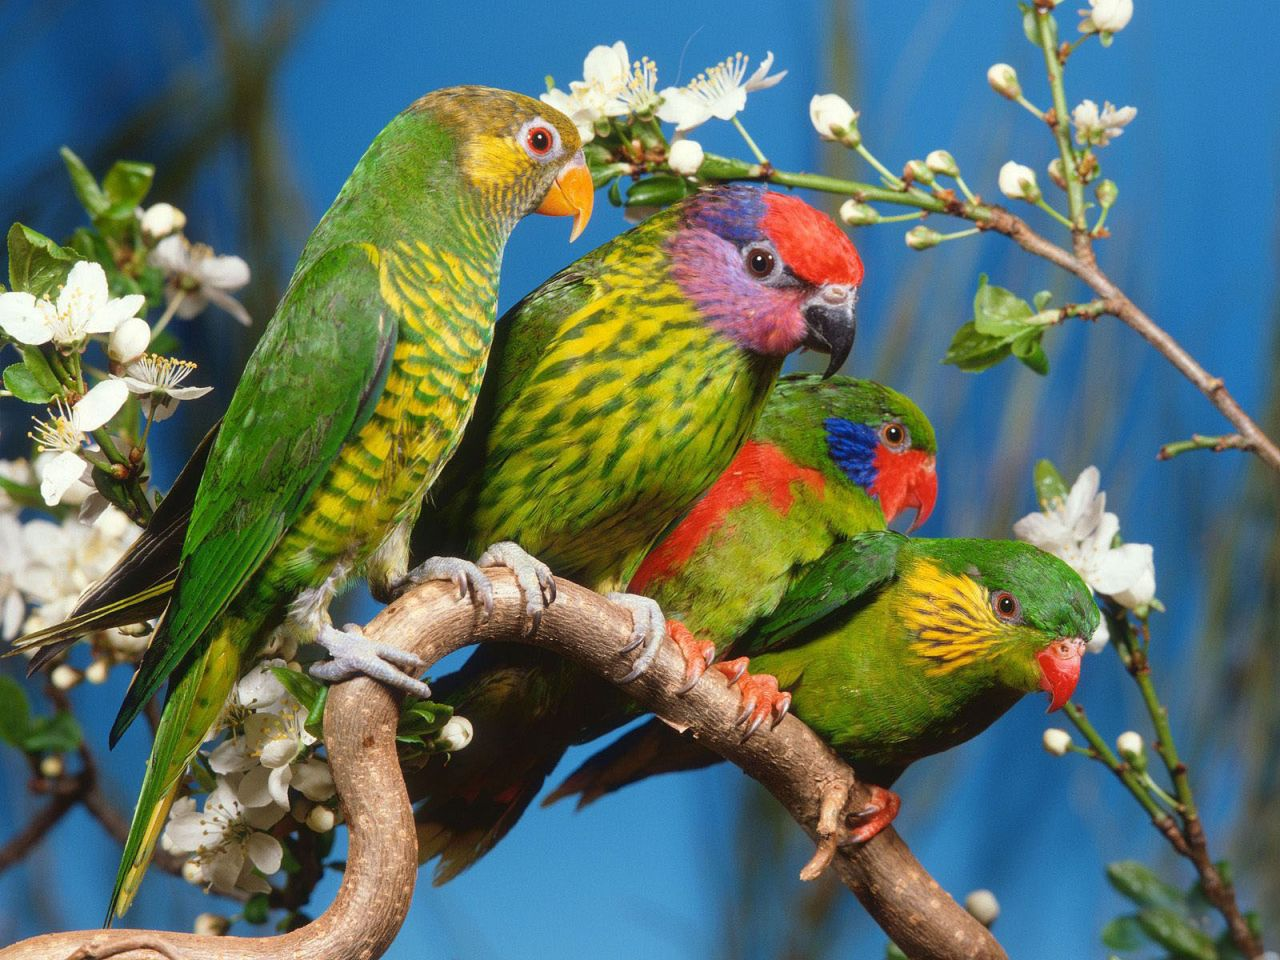 Beautiful Colorful Cute Birds Wallpaper Wallpaper ME 1280x960